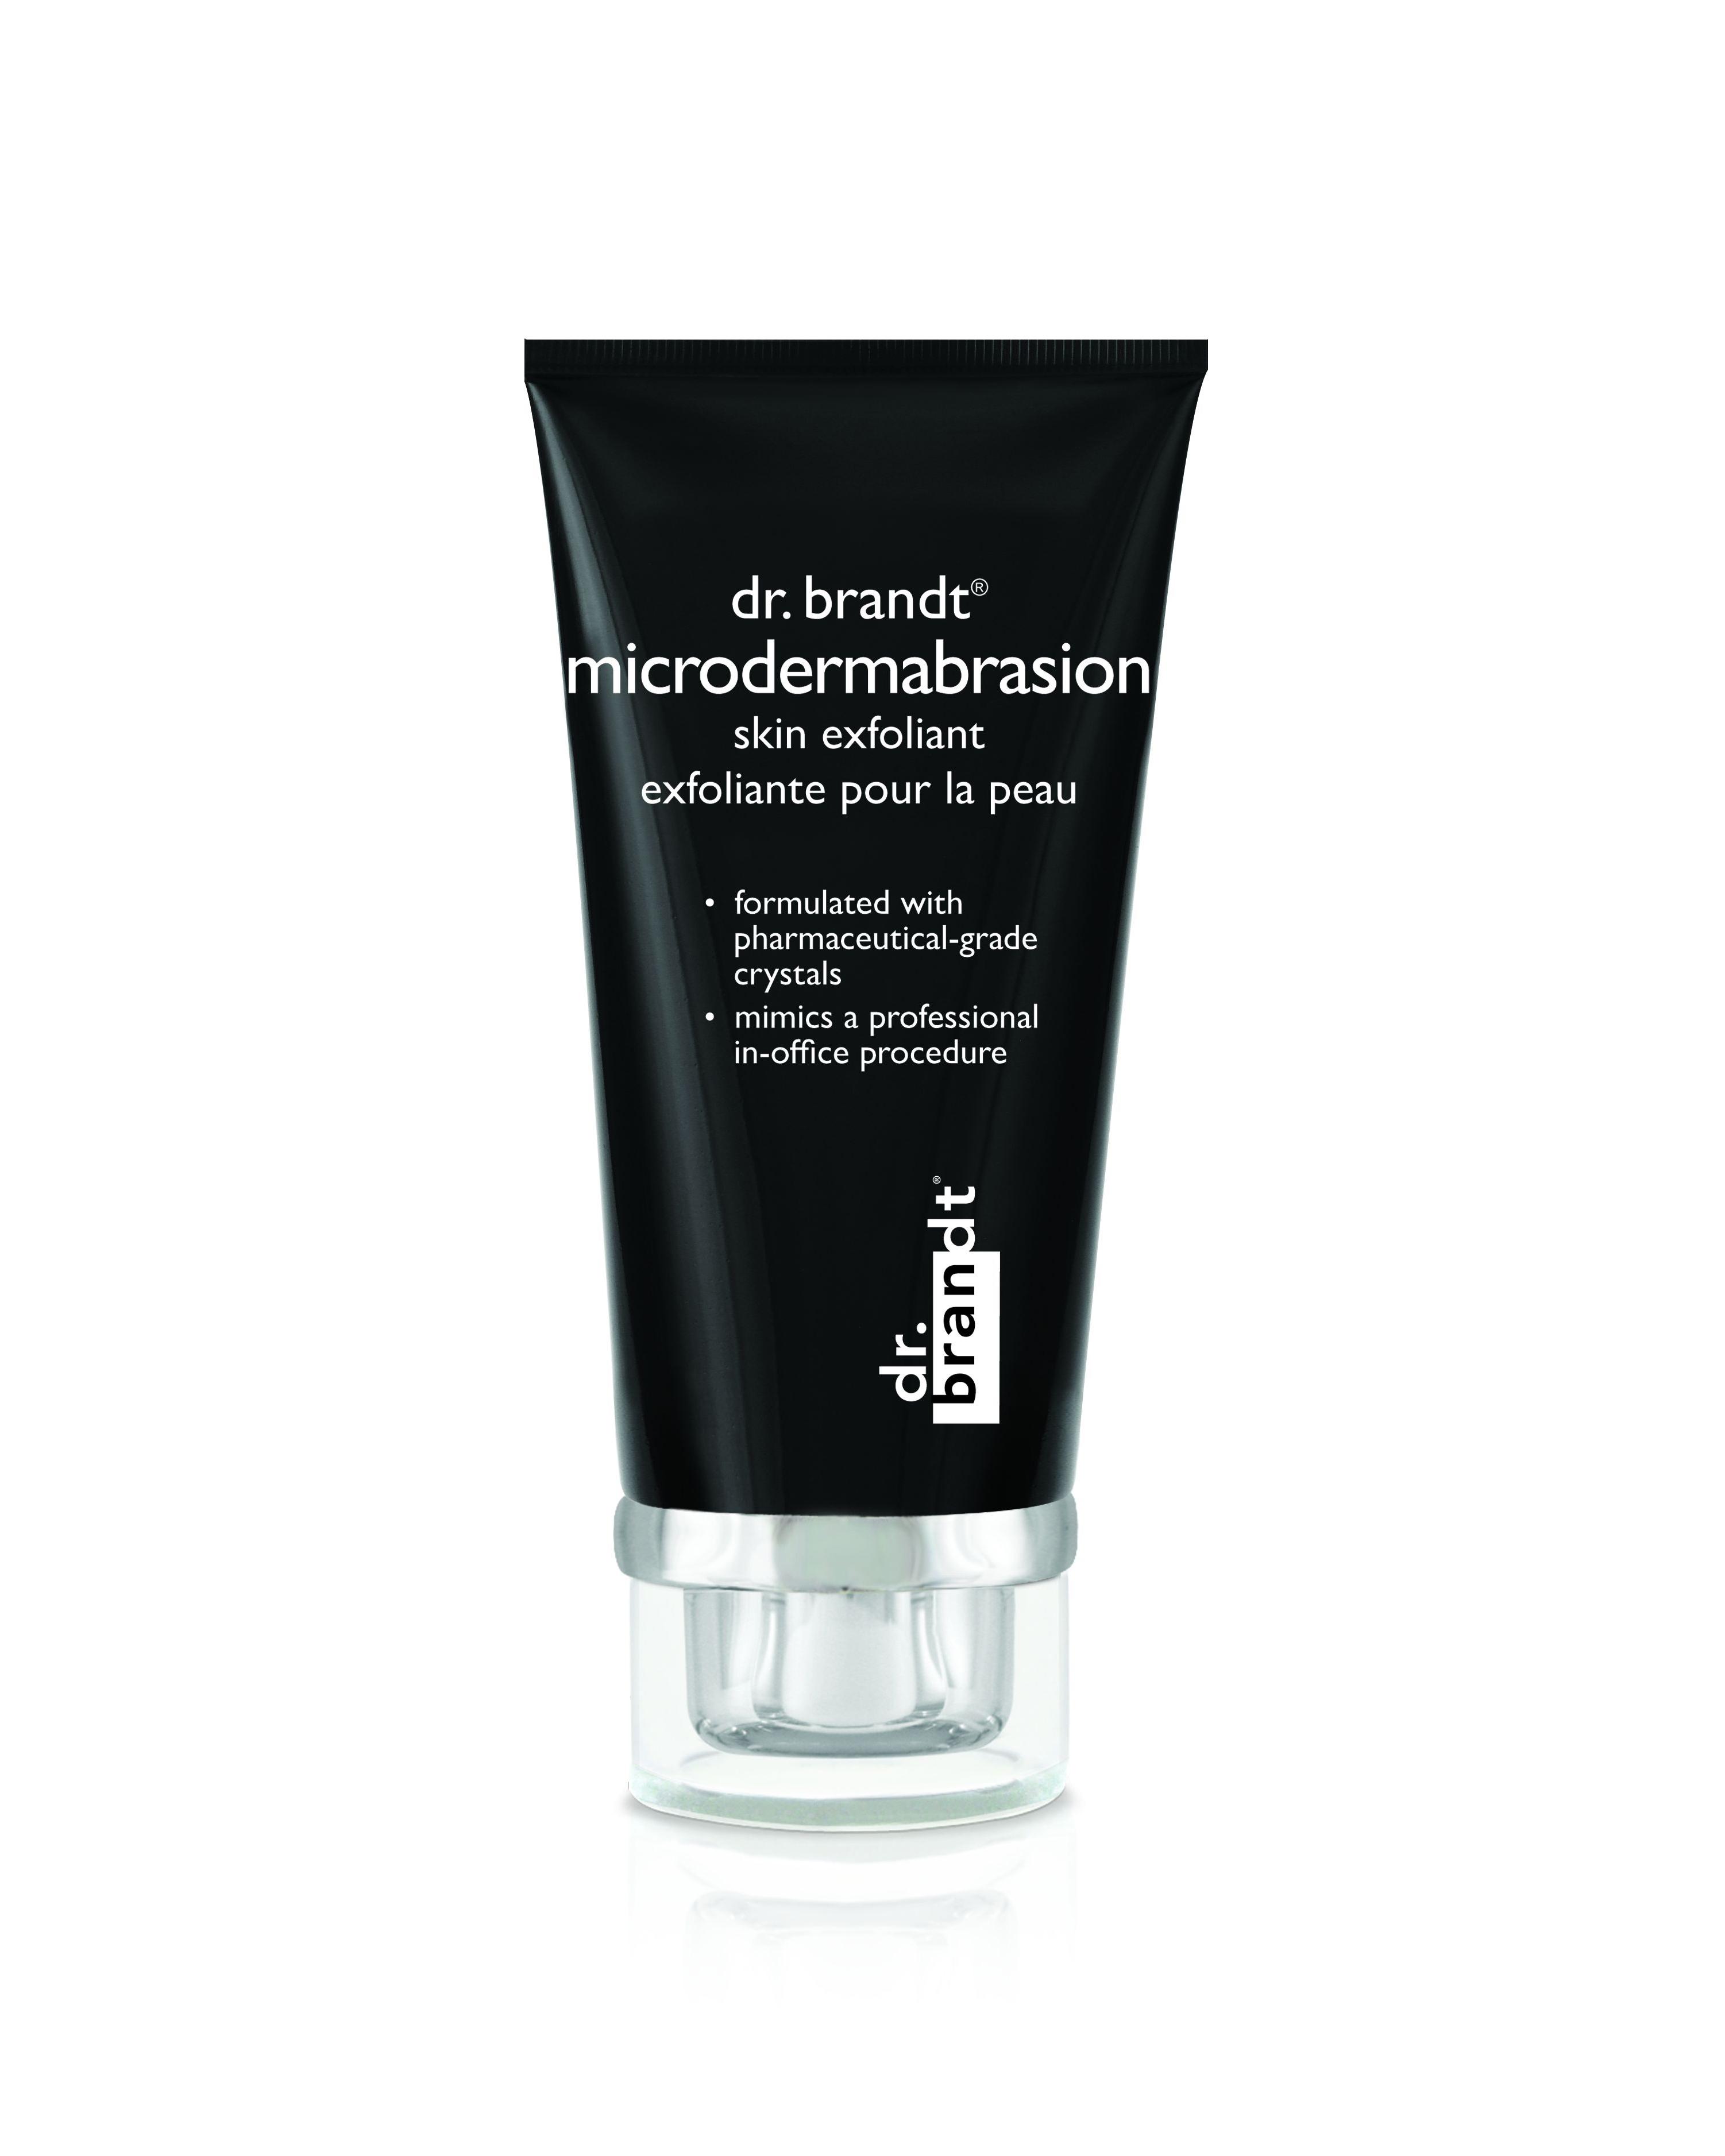 dr-brandt-microdermabrasion-skin-exfoliant-0314.jpg